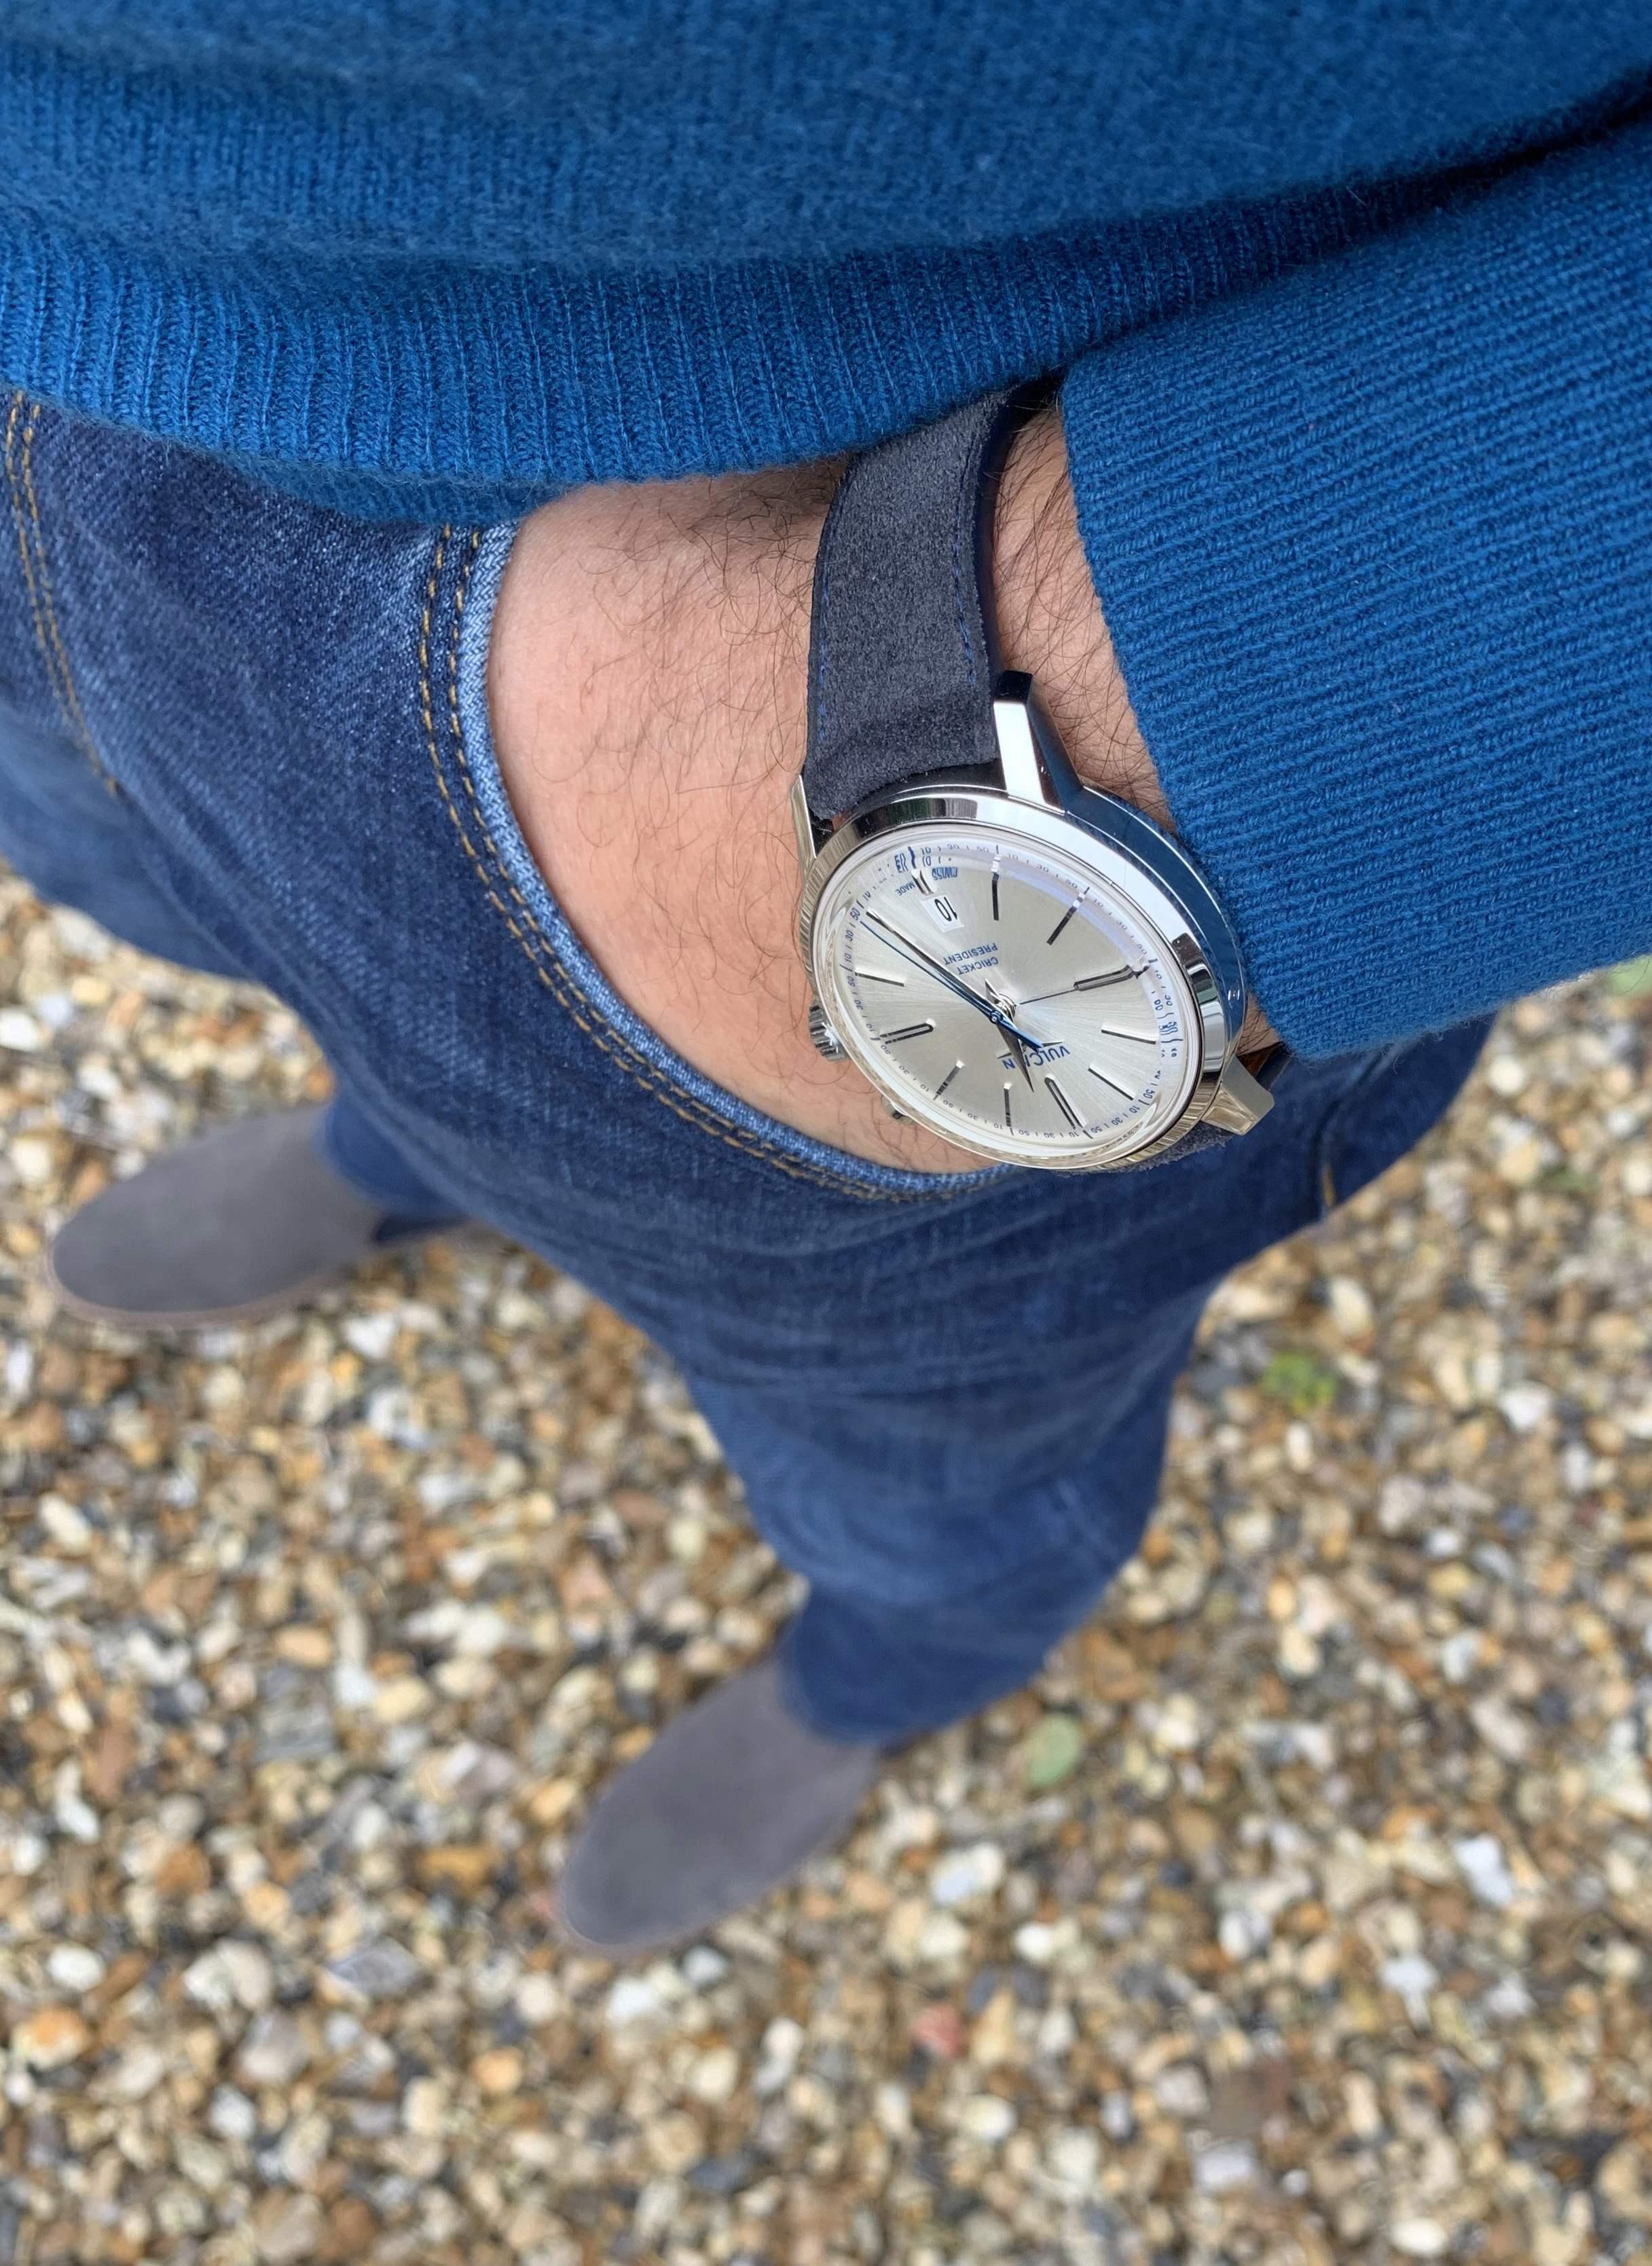 Le wrist-pocket-shoe wear topic multi-marques [tome IV] - Page 9 6a3a2210